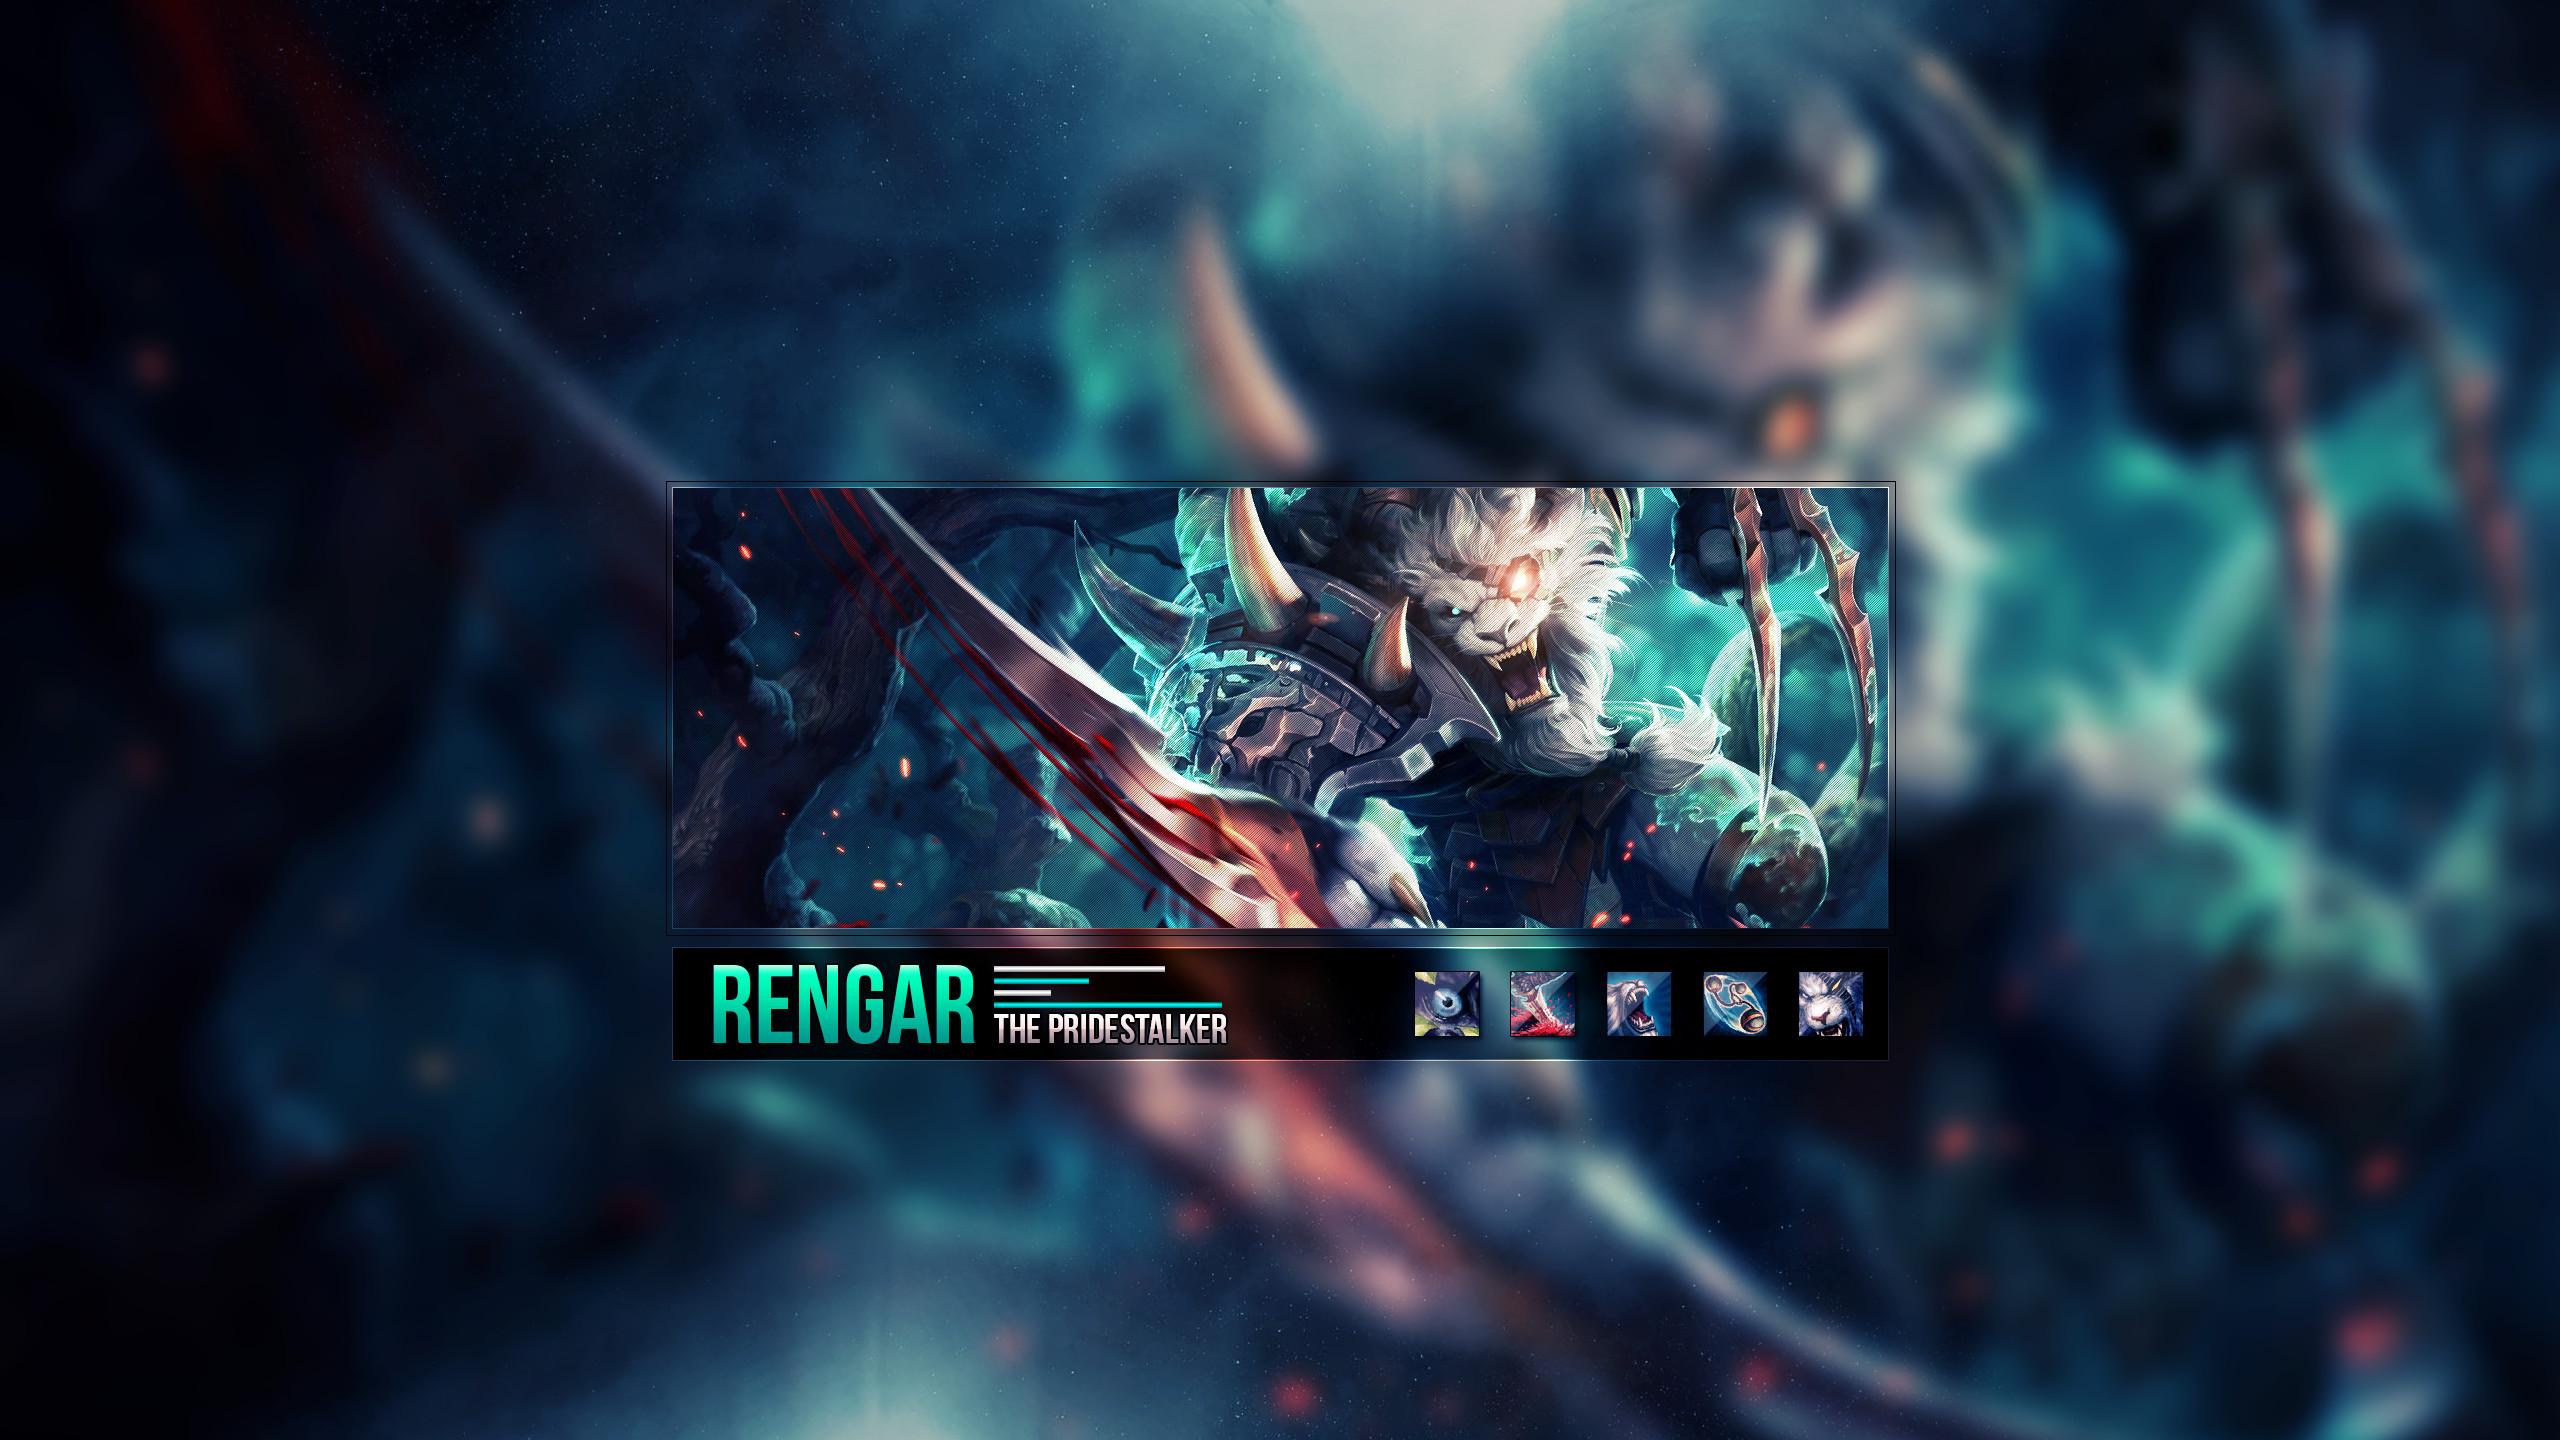 … Rengar ~ League of legends – Wallpaper by Aynoe